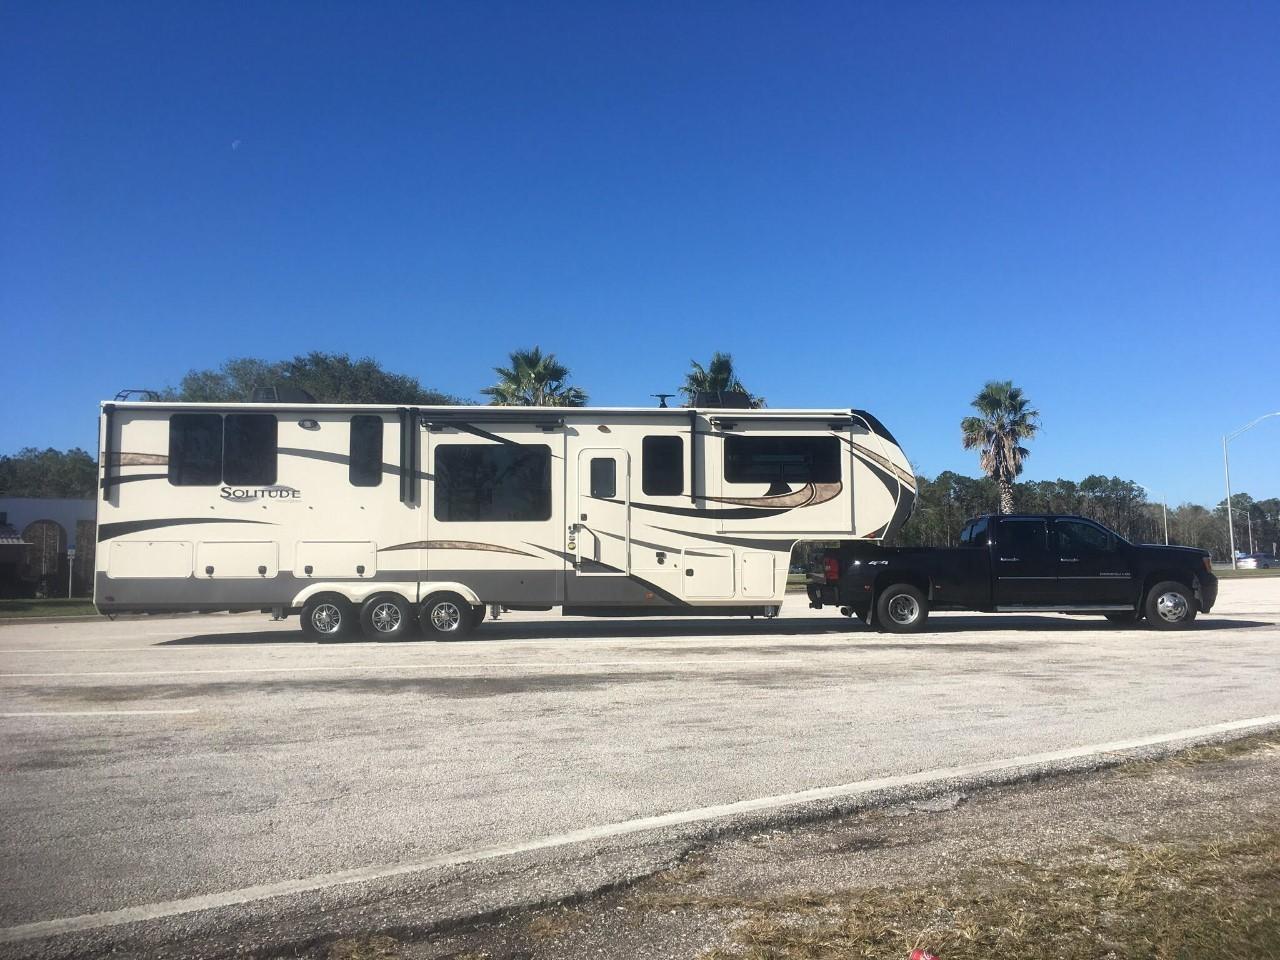 2018 Grand Design SOLITUDE 374TH For Sale In Tallahassee, FL 32303